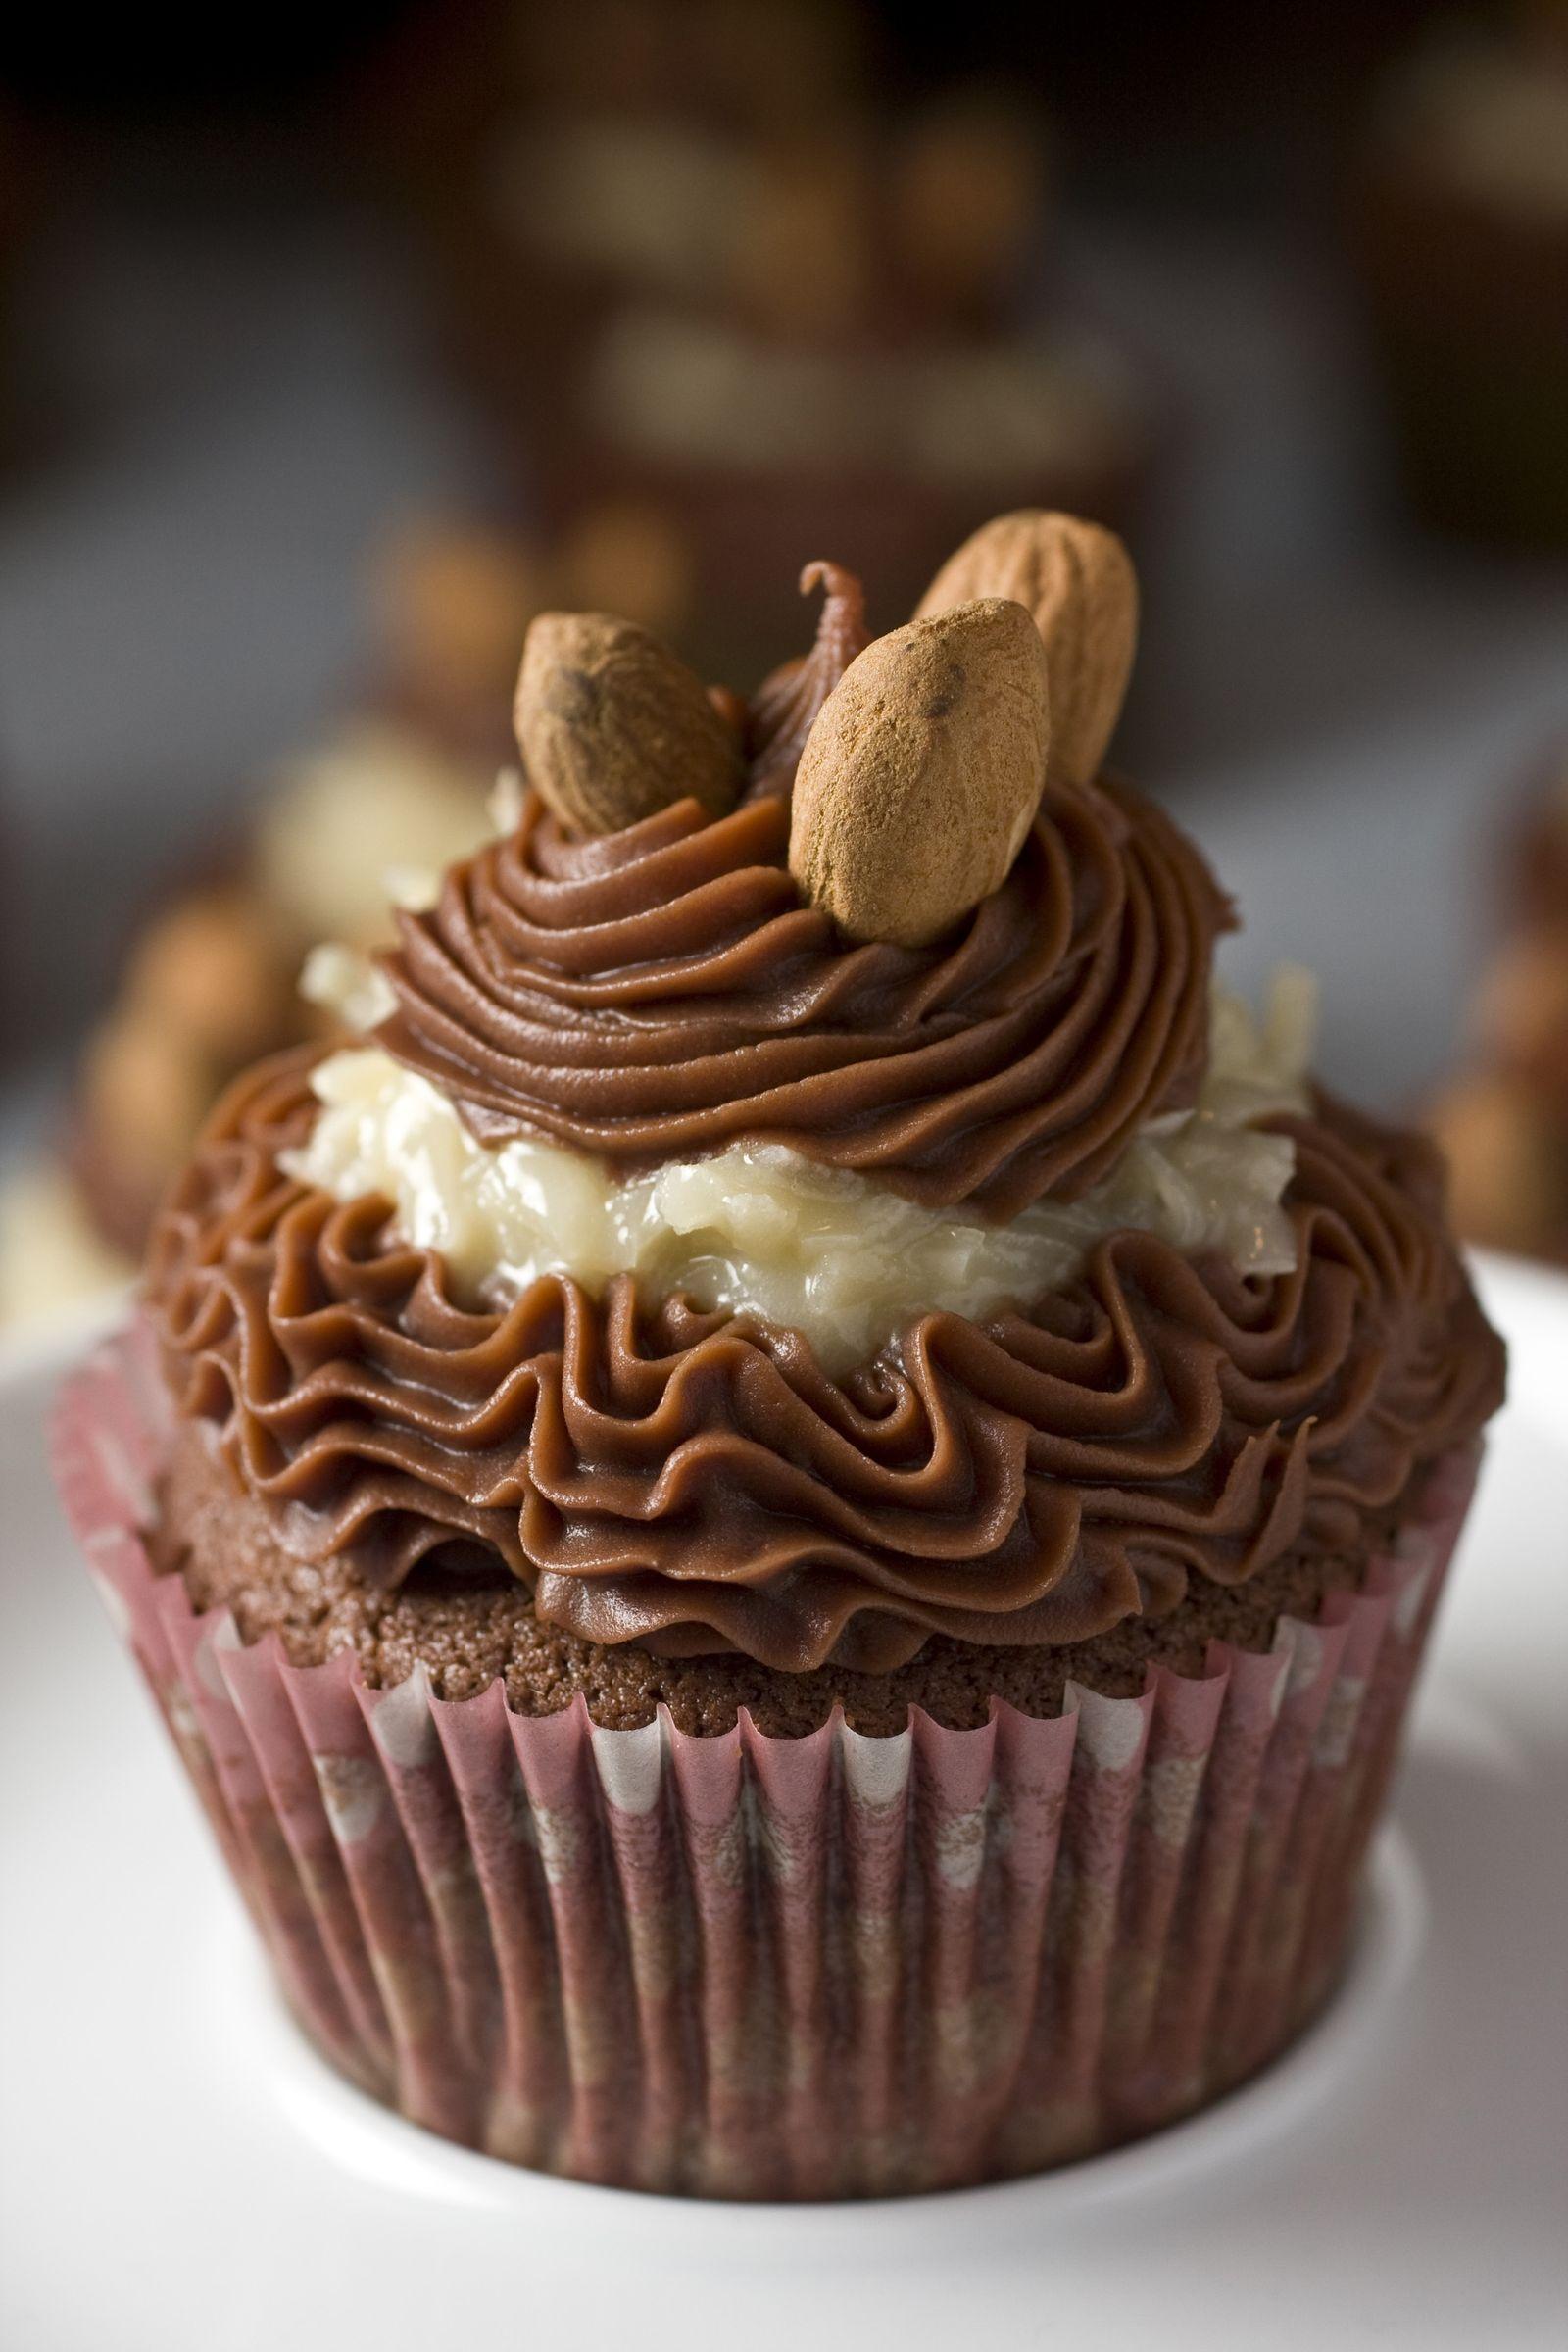 Cupcake / Schokolade / Törtchen